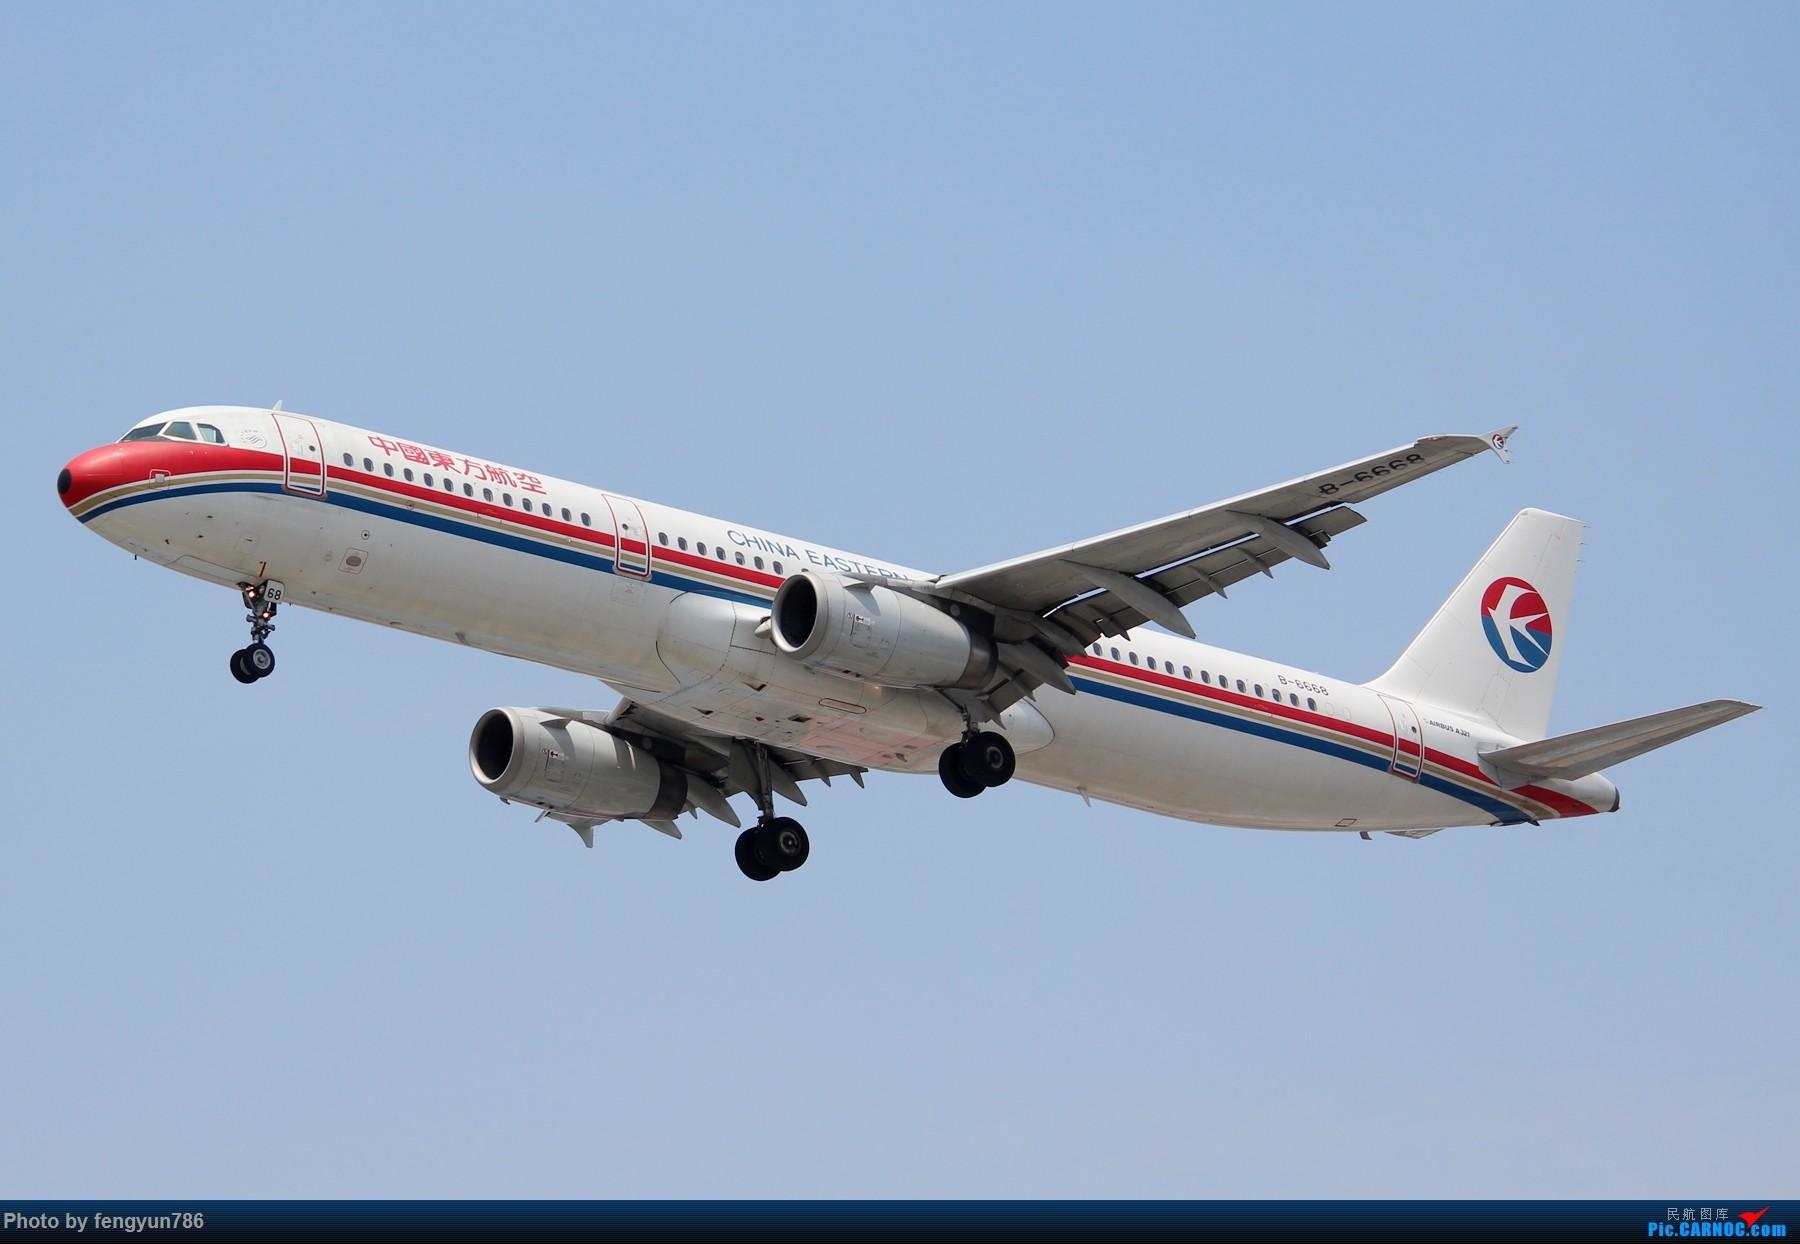 Re:[原创]7.19的SHA,天晴温高,发几个跟前一天不一样的。 AIRBUS A321-200 B-6668 中国上海虹桥国际机场